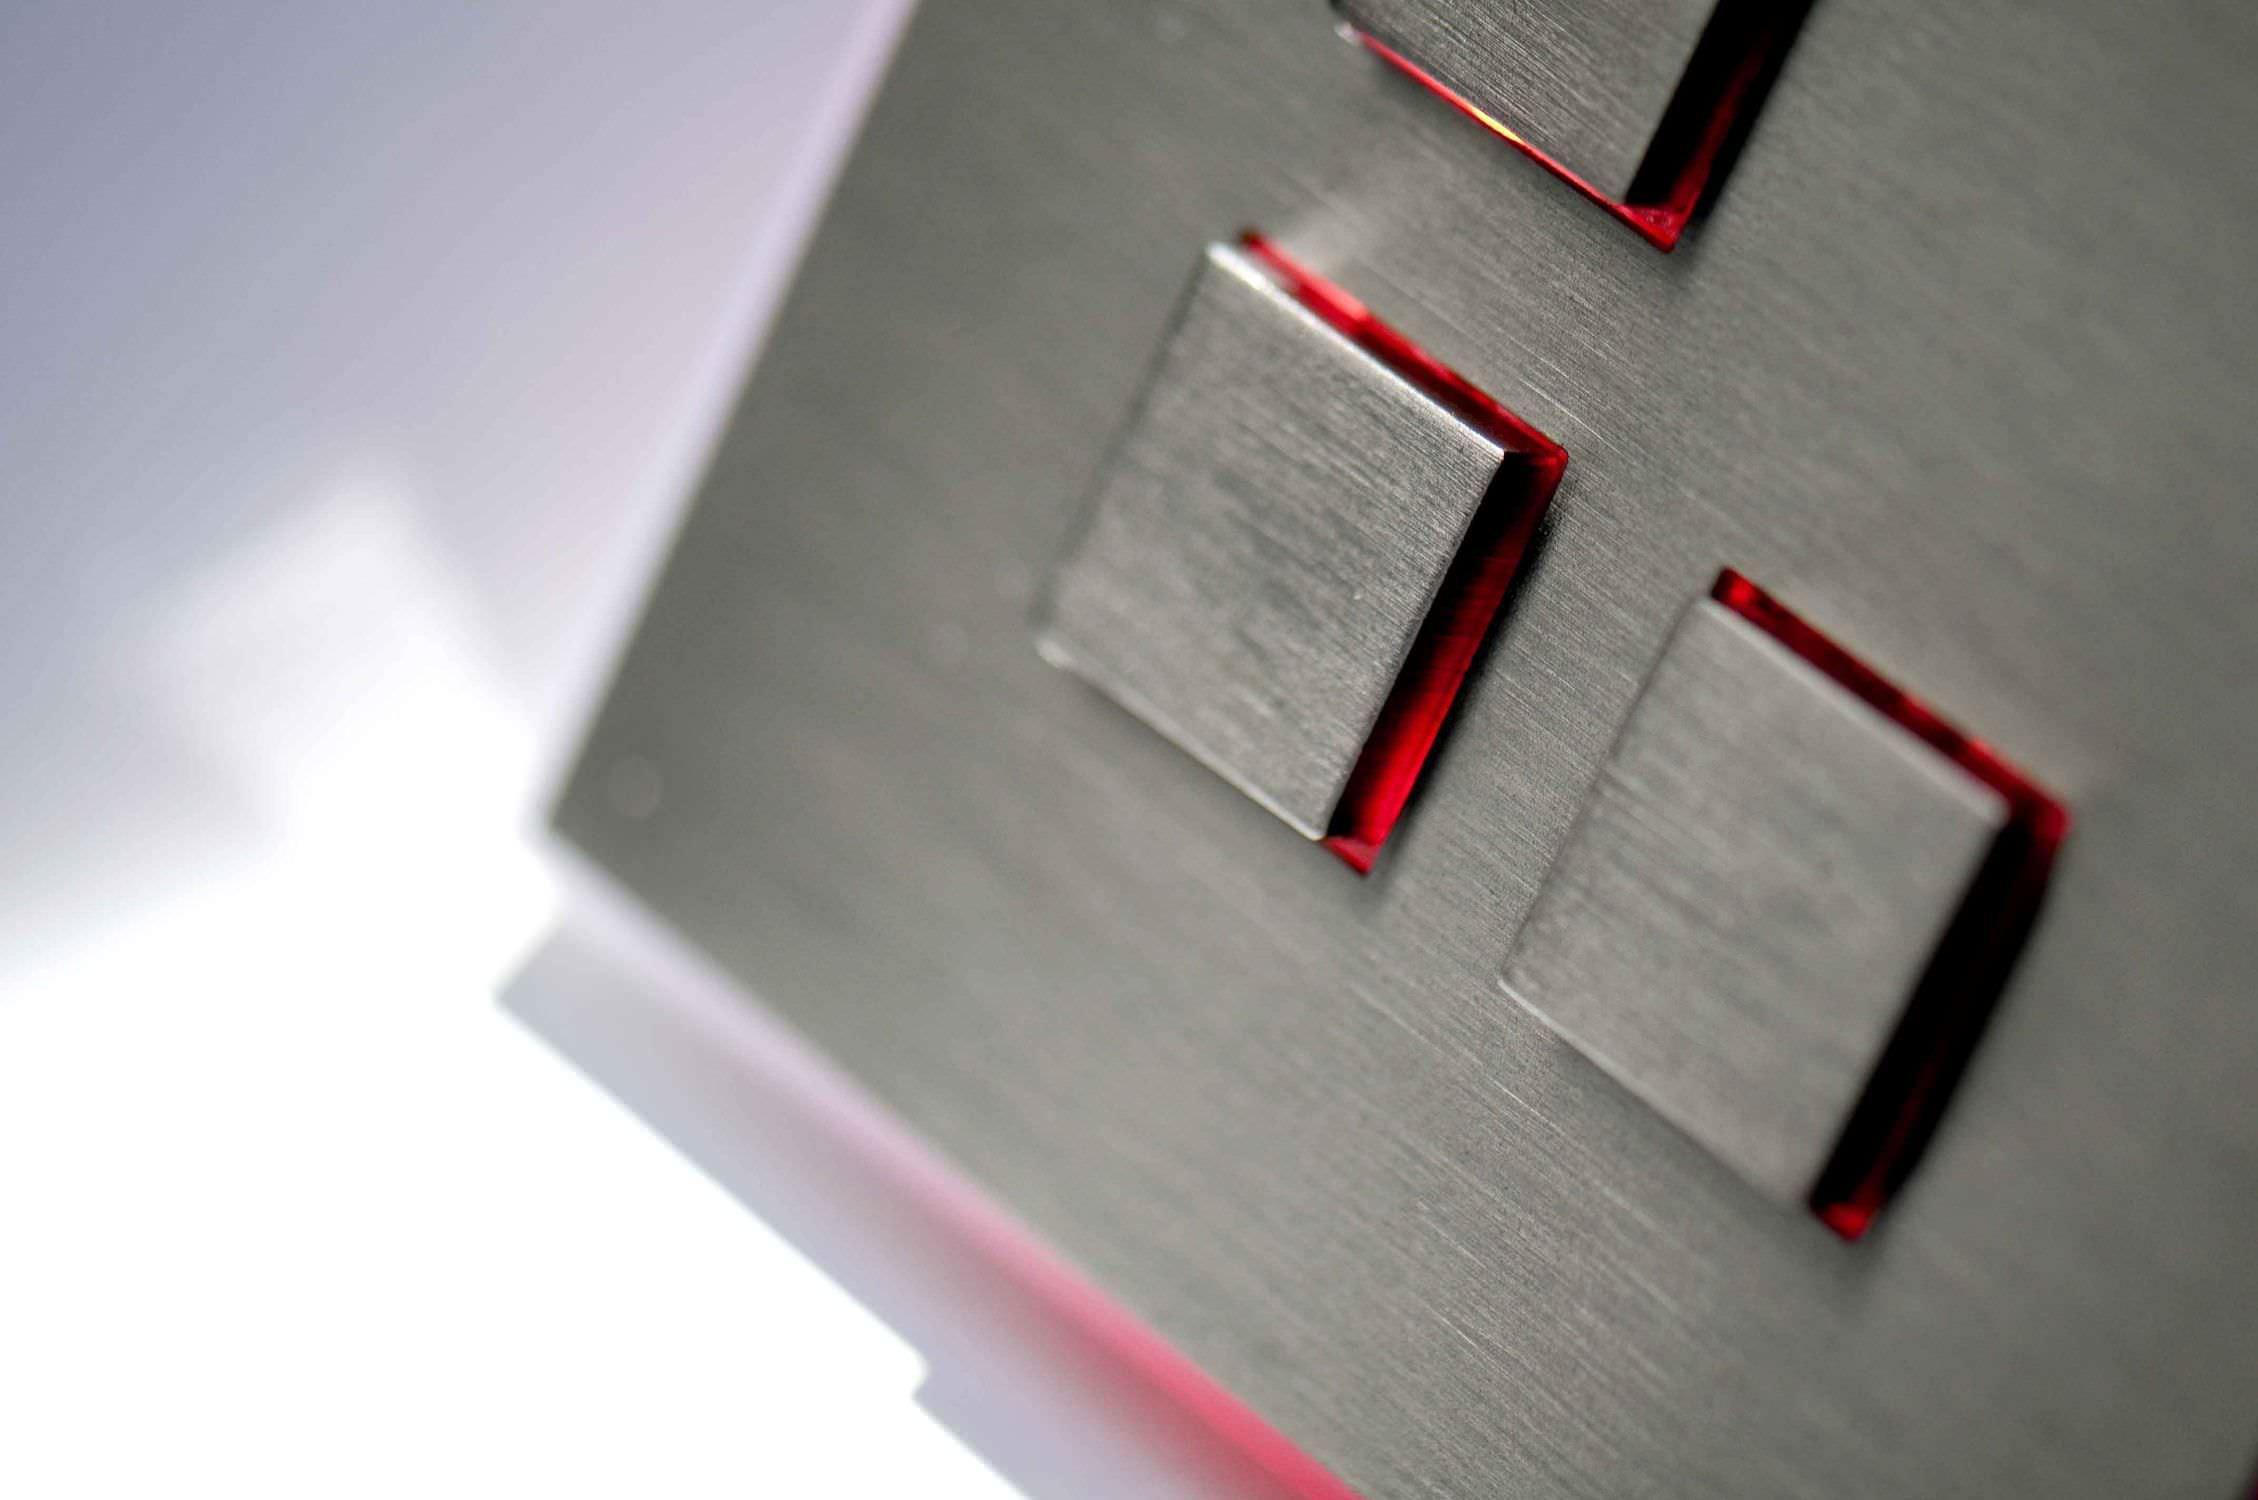 light-switch-push-button-quadruple-stainless-steel-49562-2106203.jpg